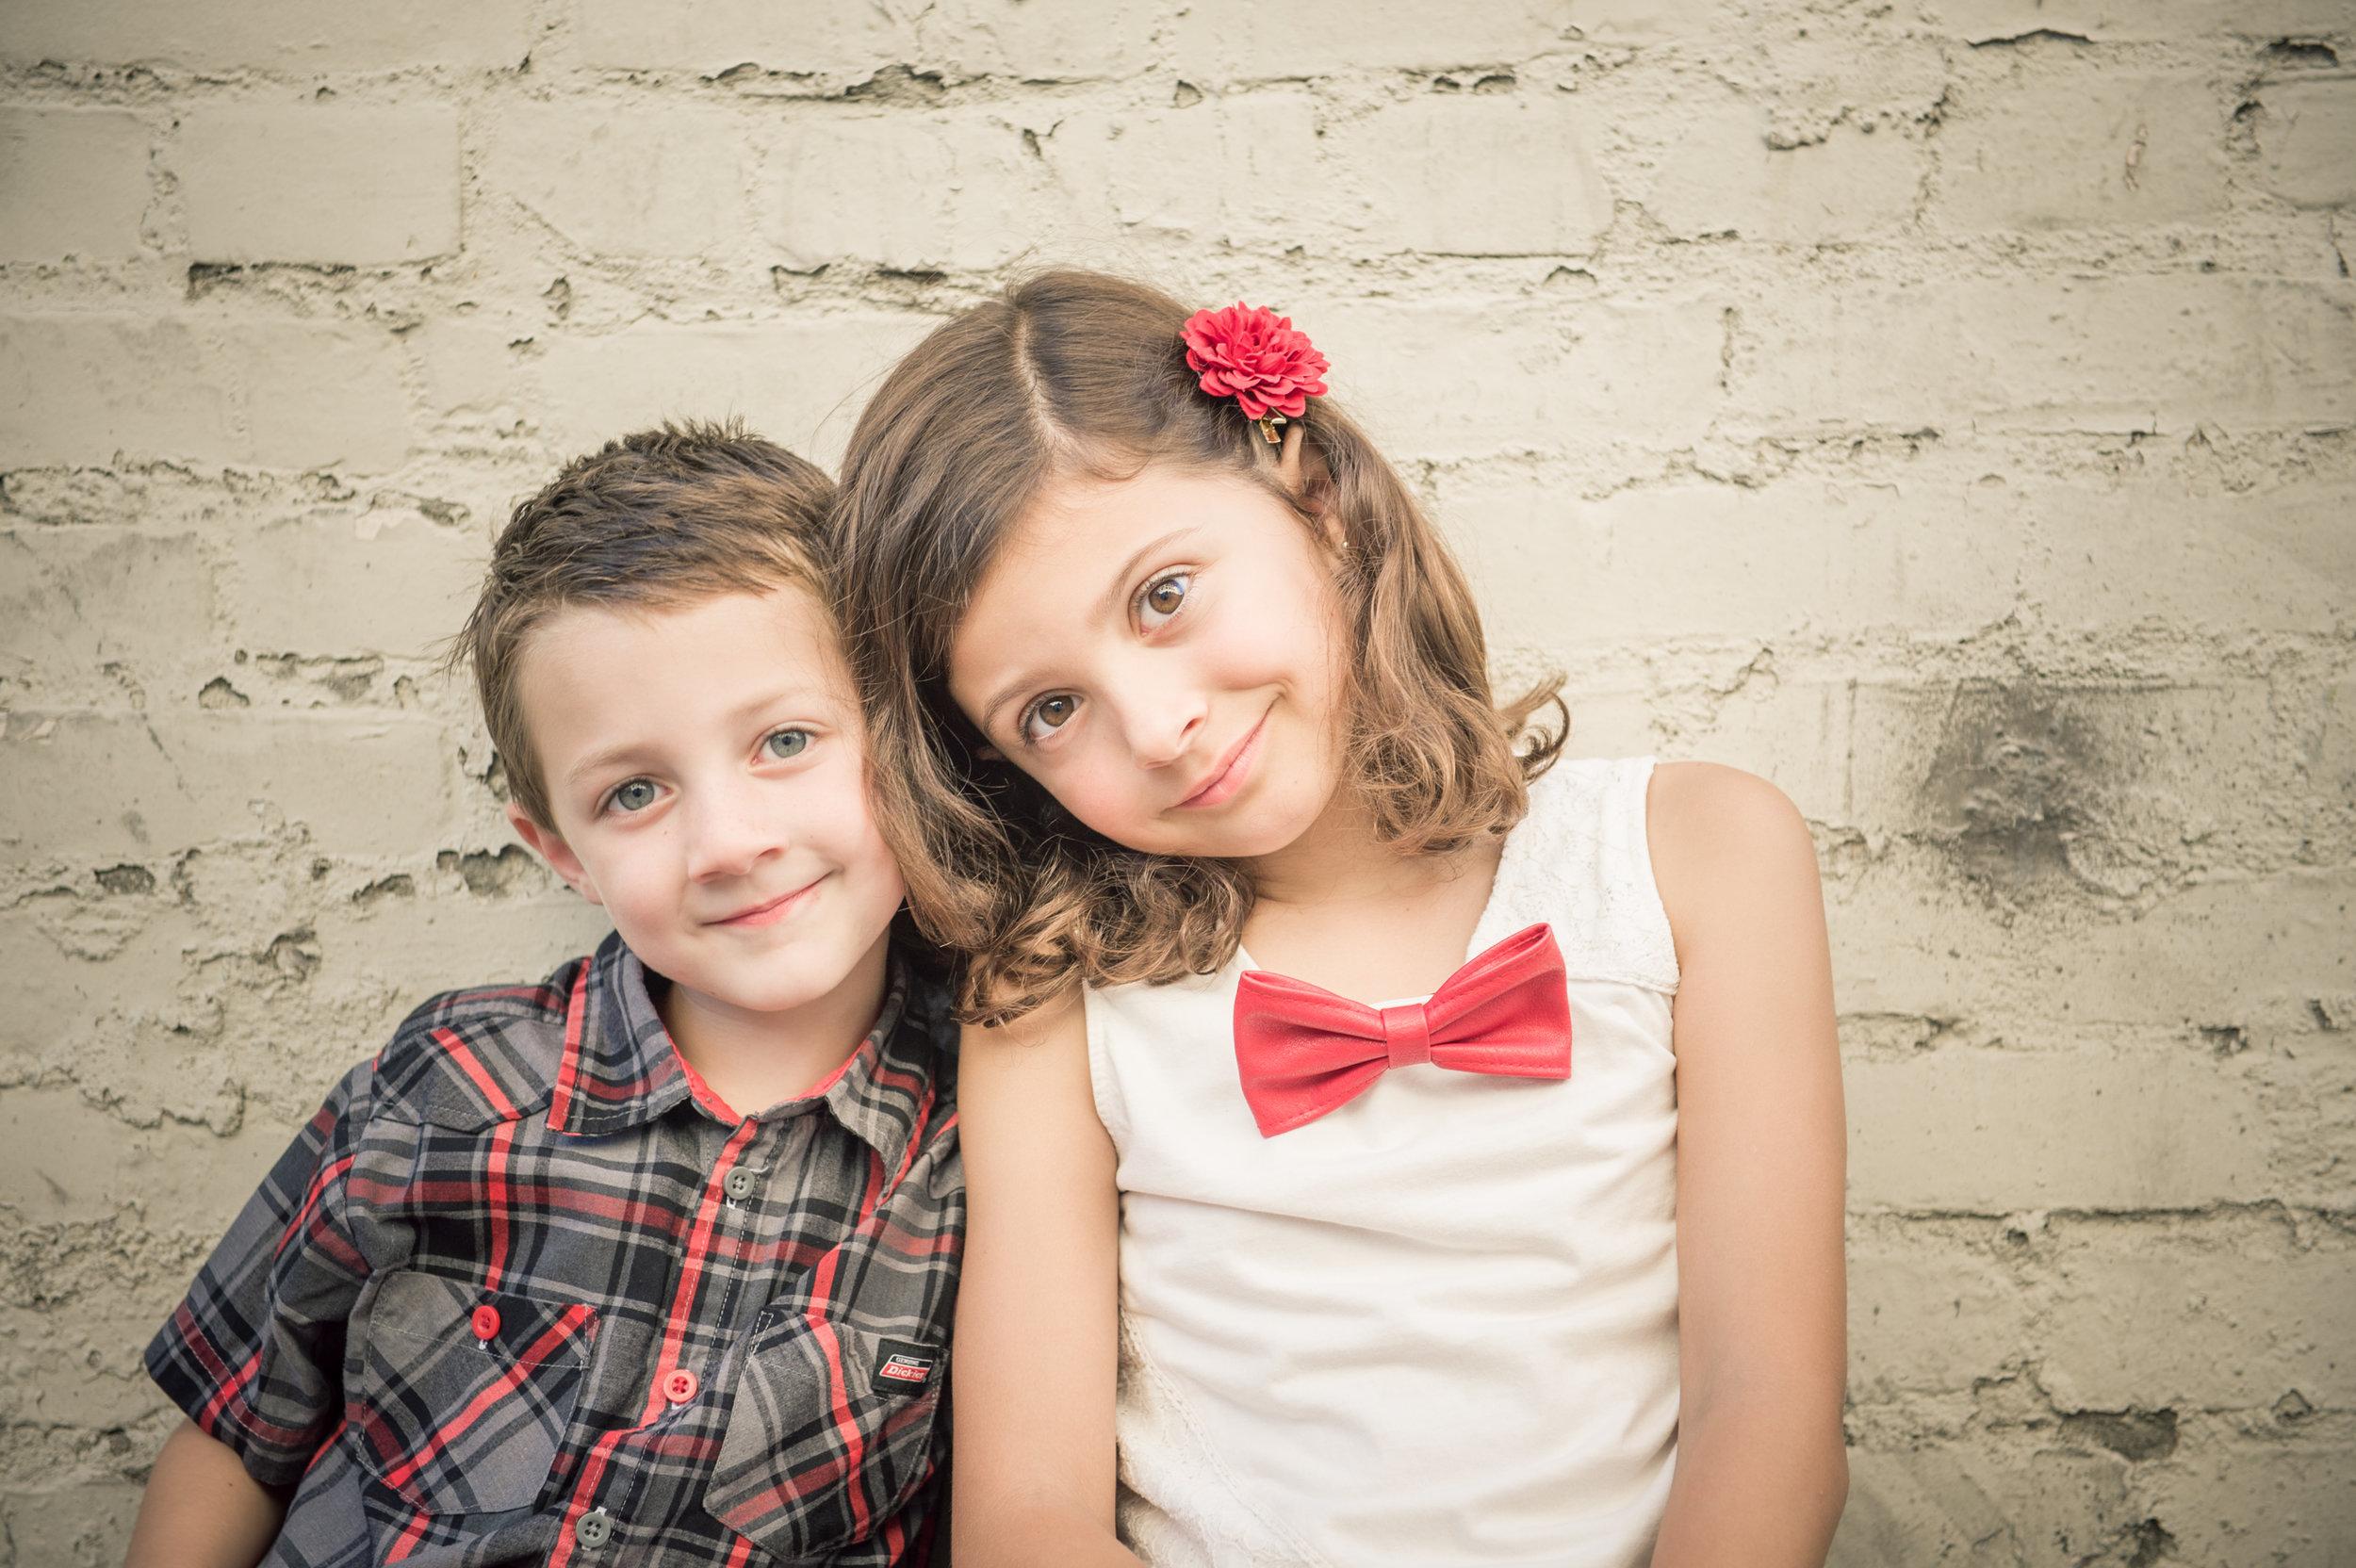 A boy and girl siblings sitting shoulder to shoulder